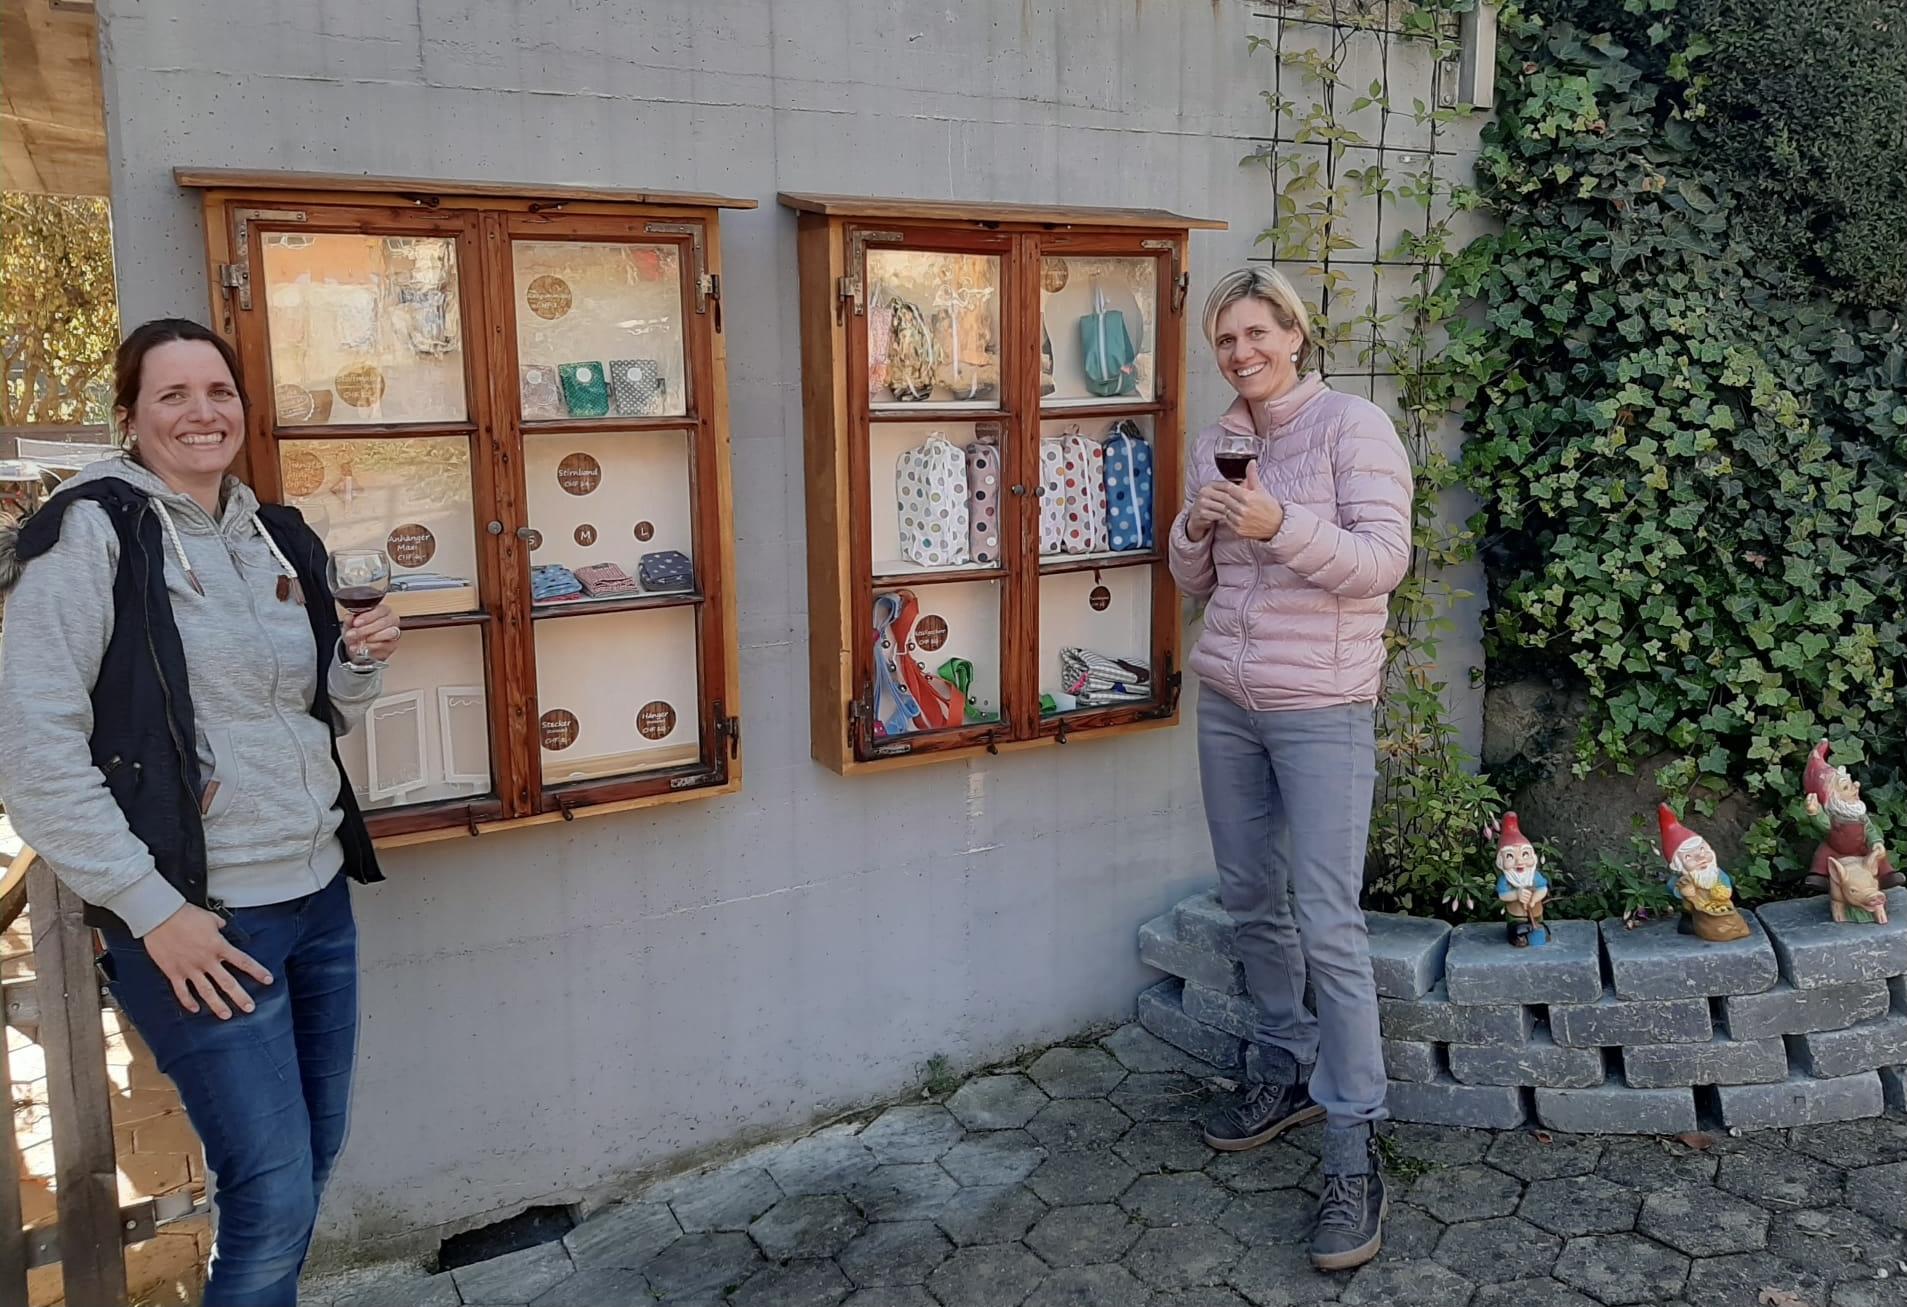 Eröffnung Fenster-Lädeli Oberwil 5